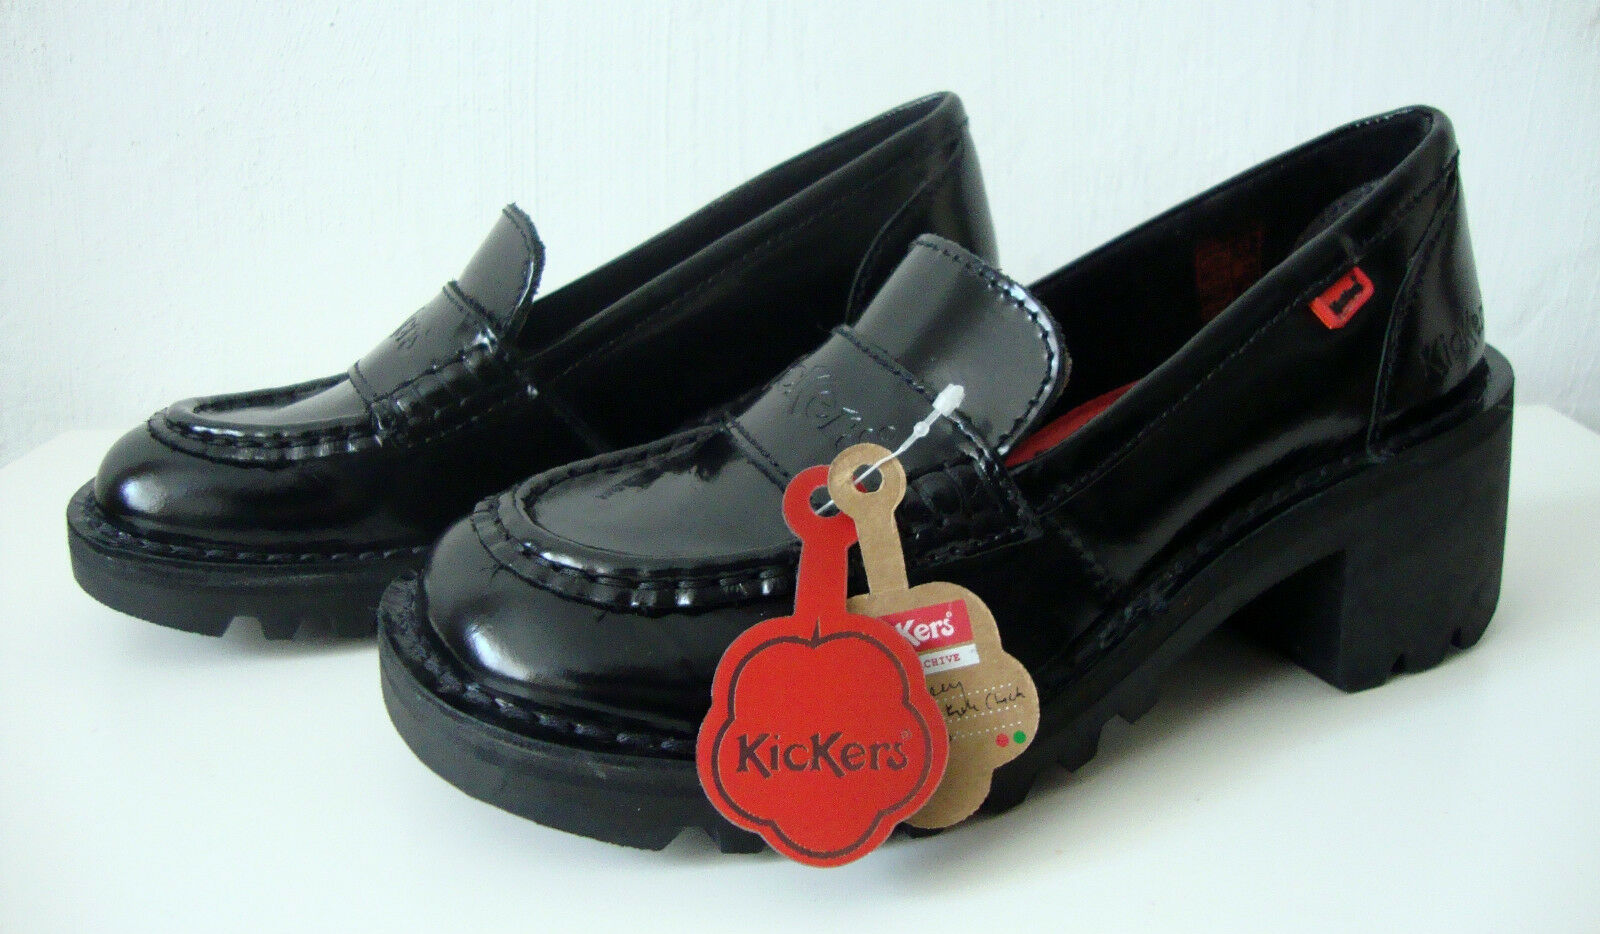 Leder KOPEY KICK KICKERS Loafers ETIKETT mit NEU Schwarz